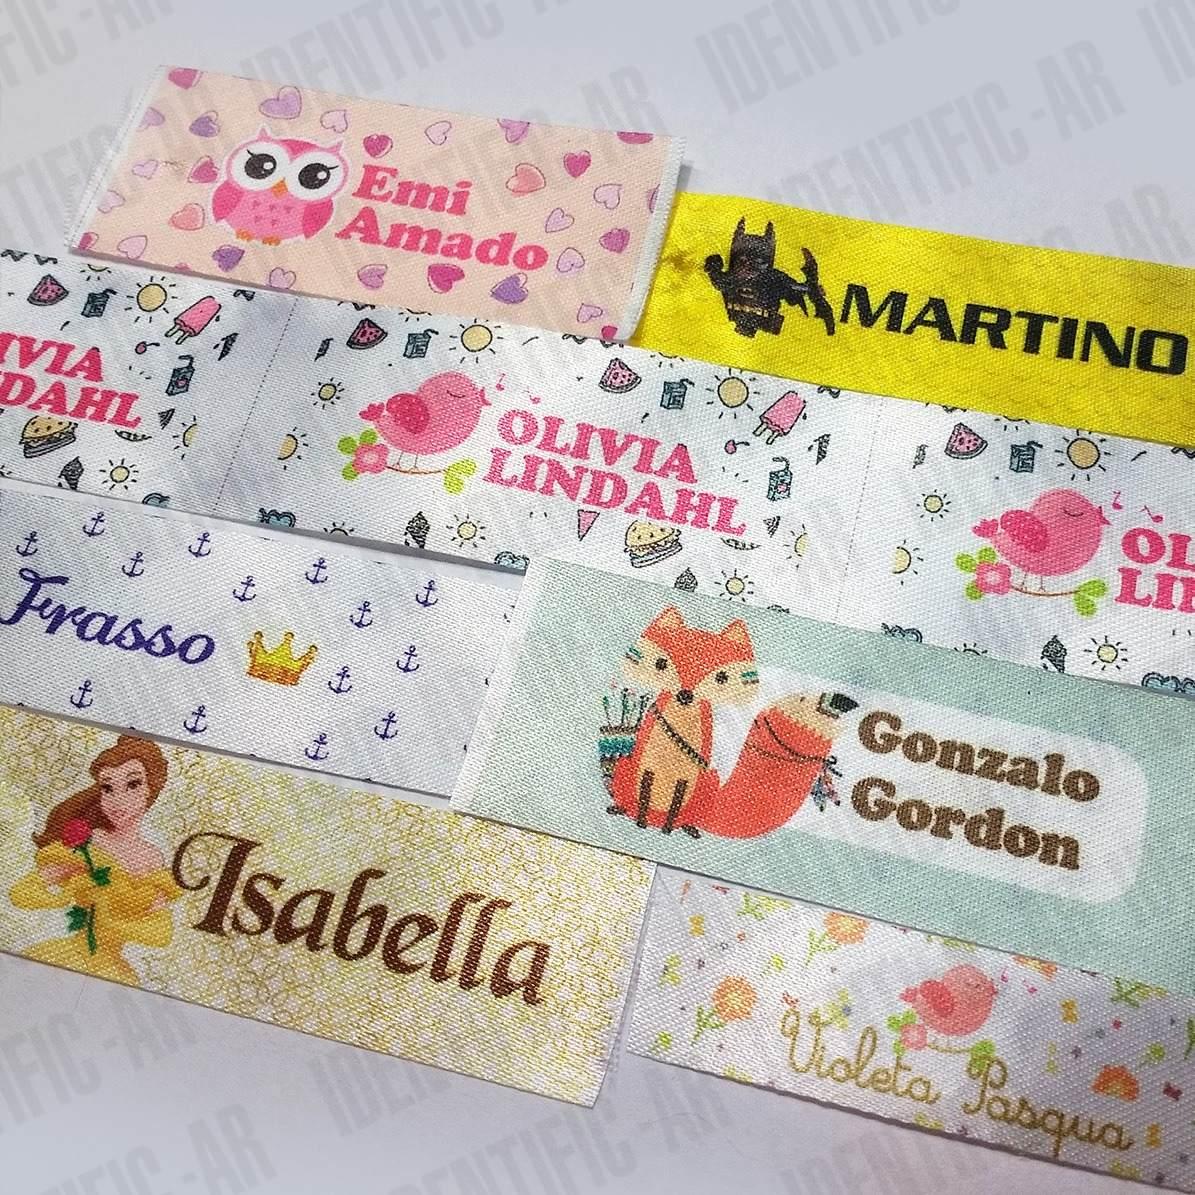 Cintas Con Nombre Etiquetas Escolares Para Coser X 50 - $ 150,00 en ...